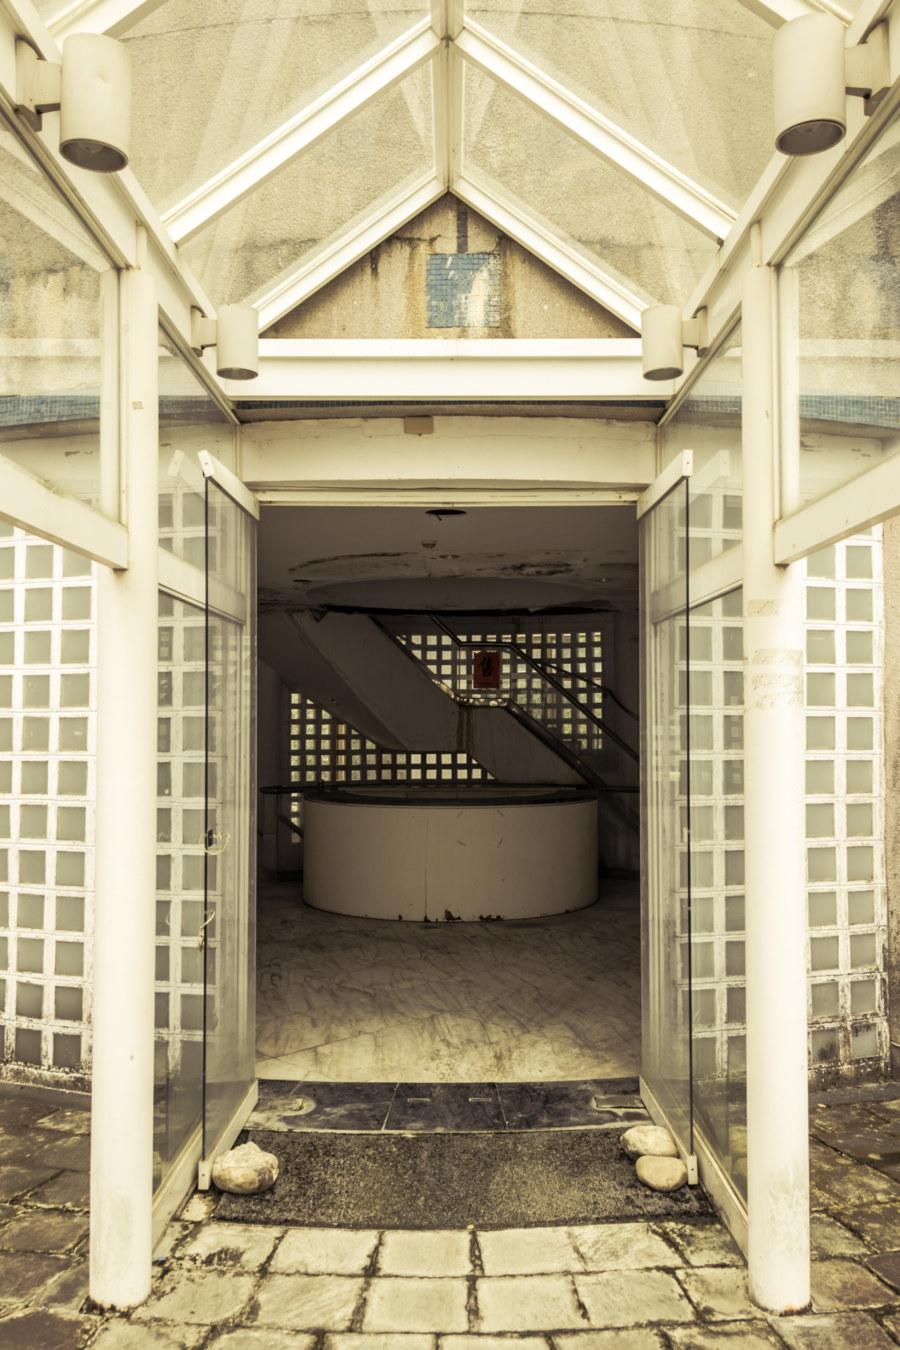 The entrance to the Renoir resort club 雷諾瓦俱樂部